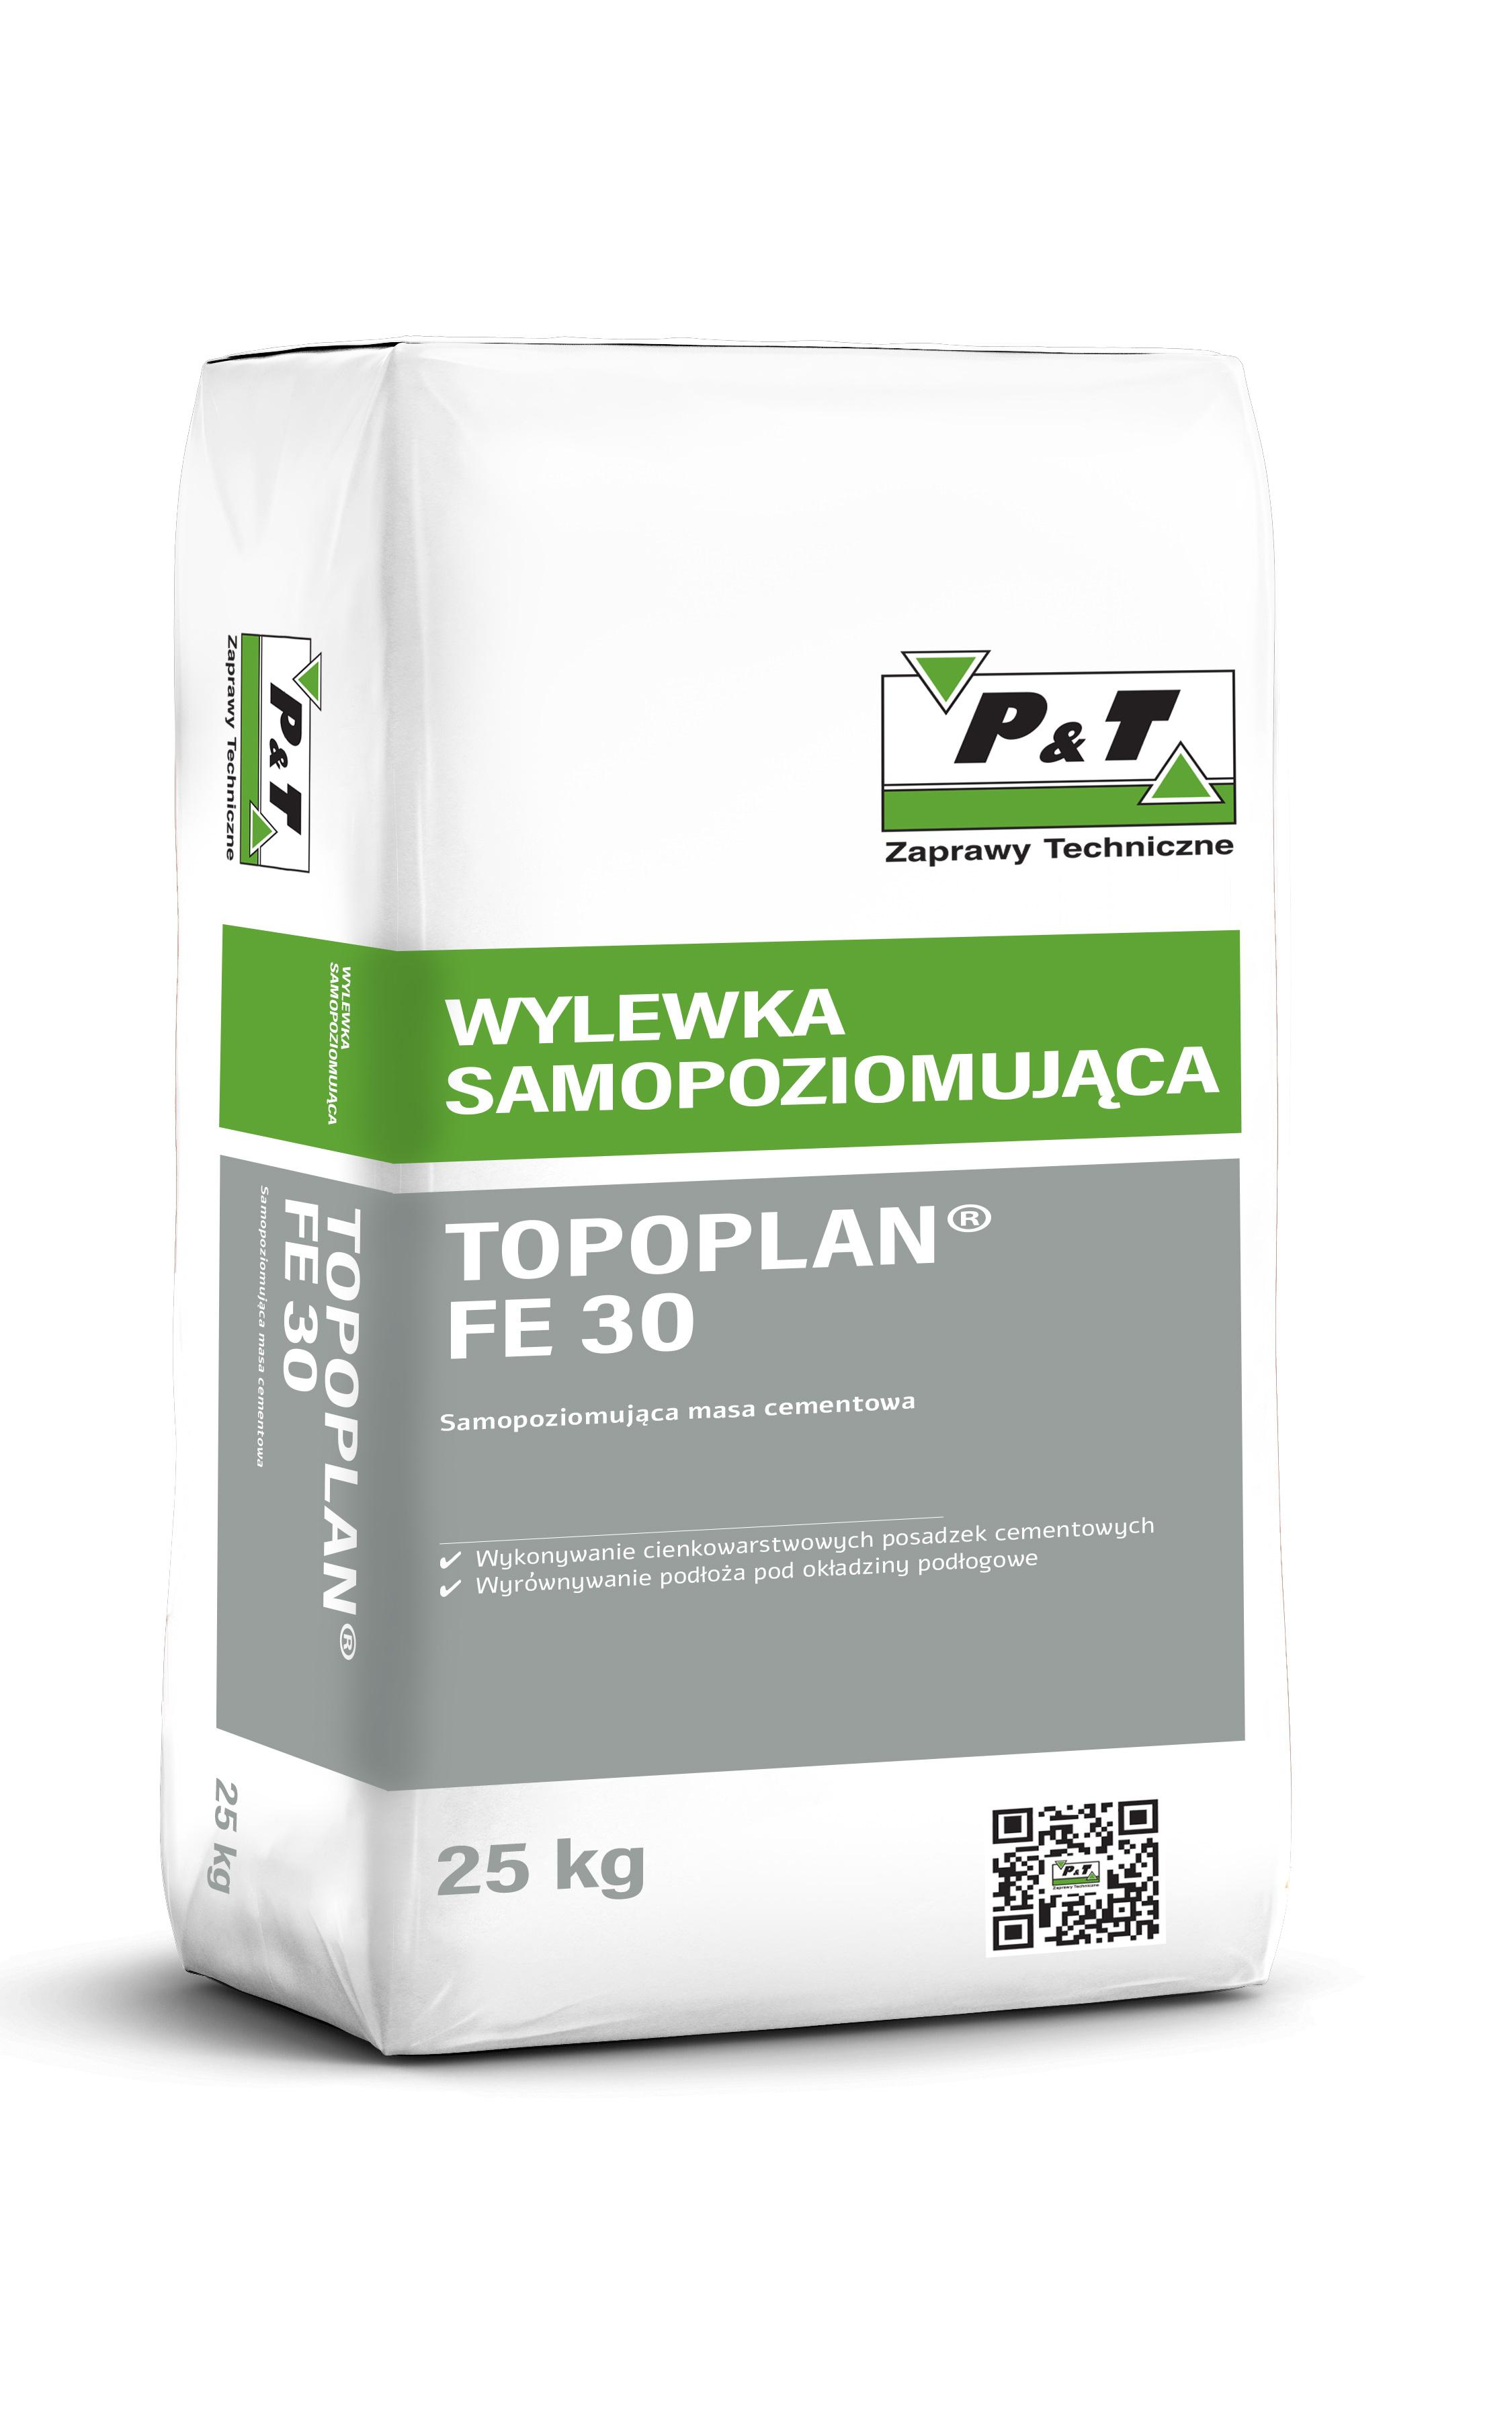 Topoplan FE 30